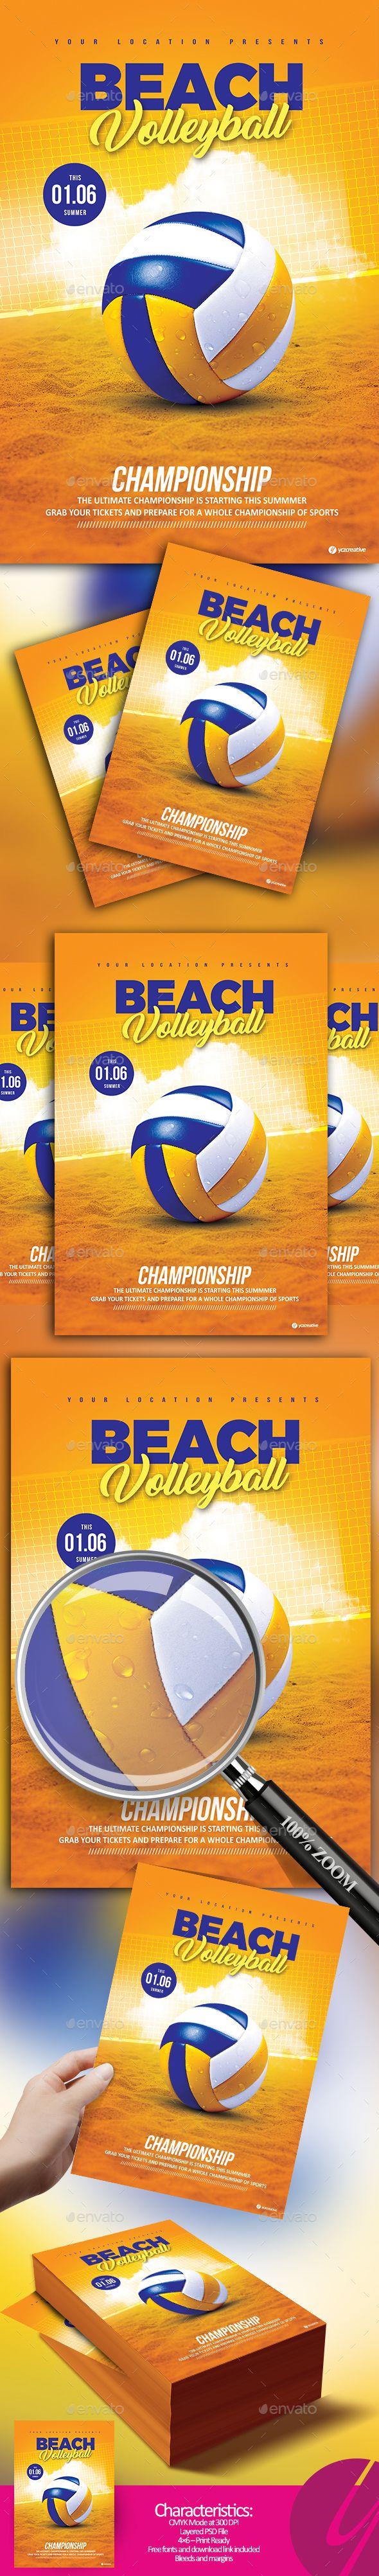 Beach Volleyball Championship — Photoshop PSD #sport #4x6 • Download ➝ https://graphicriver.net/item/beach-volleyball-championship/19977332?ref=pxcr